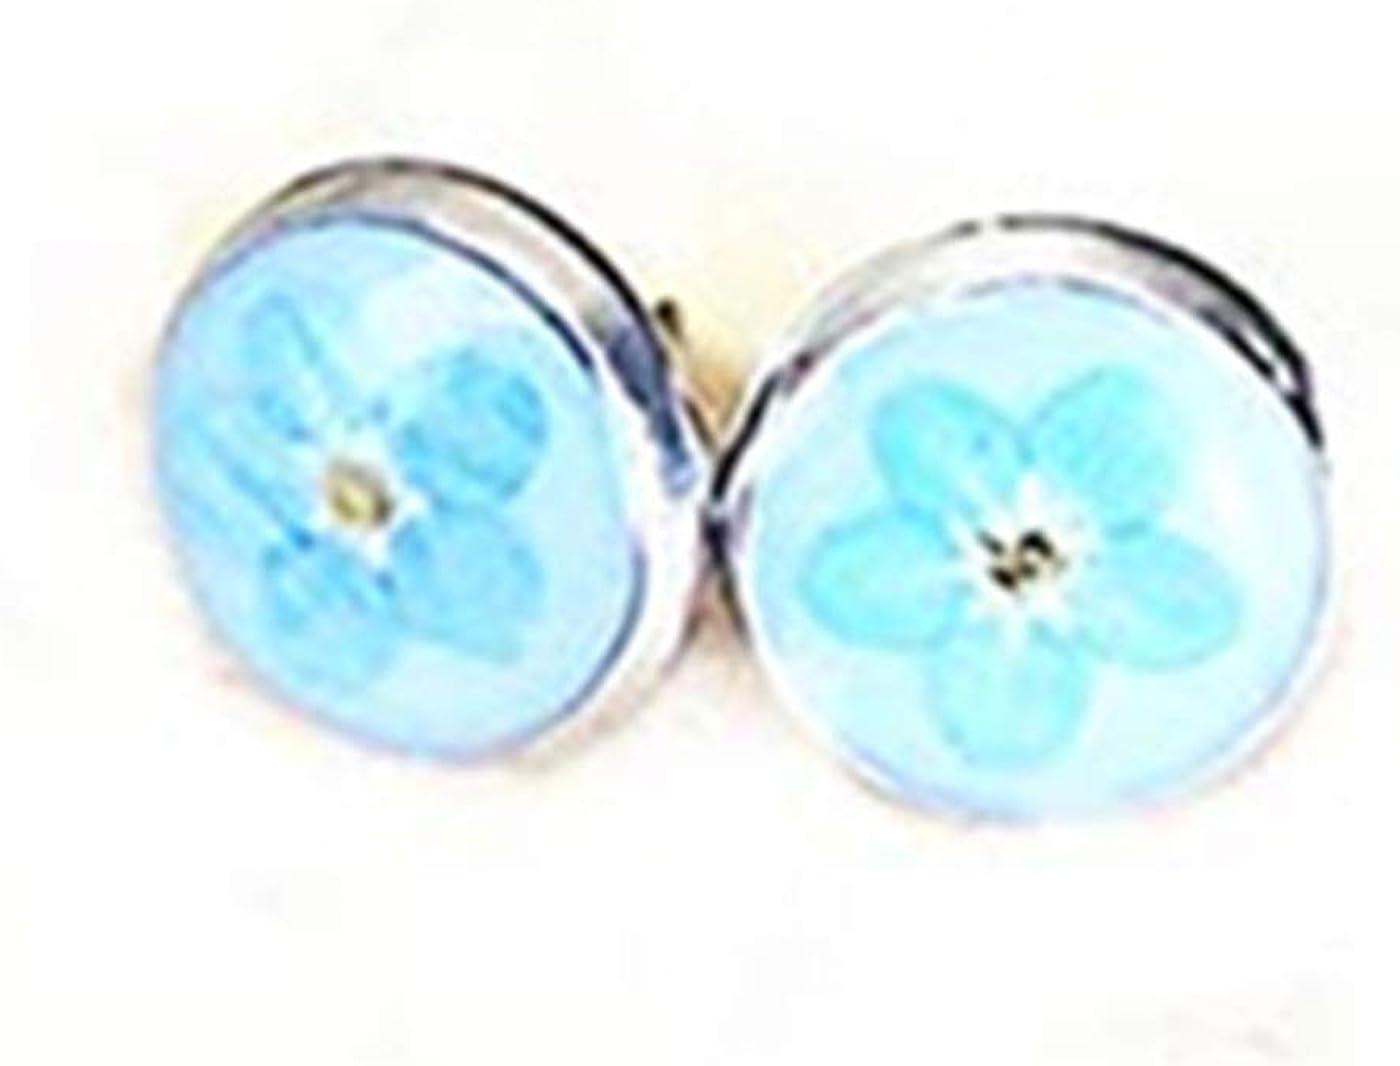 Nature earrings Long dangle earrings Nature jewelry Resin flower earrings Nature lover gift Blue Forget me not earring Real flower earrings